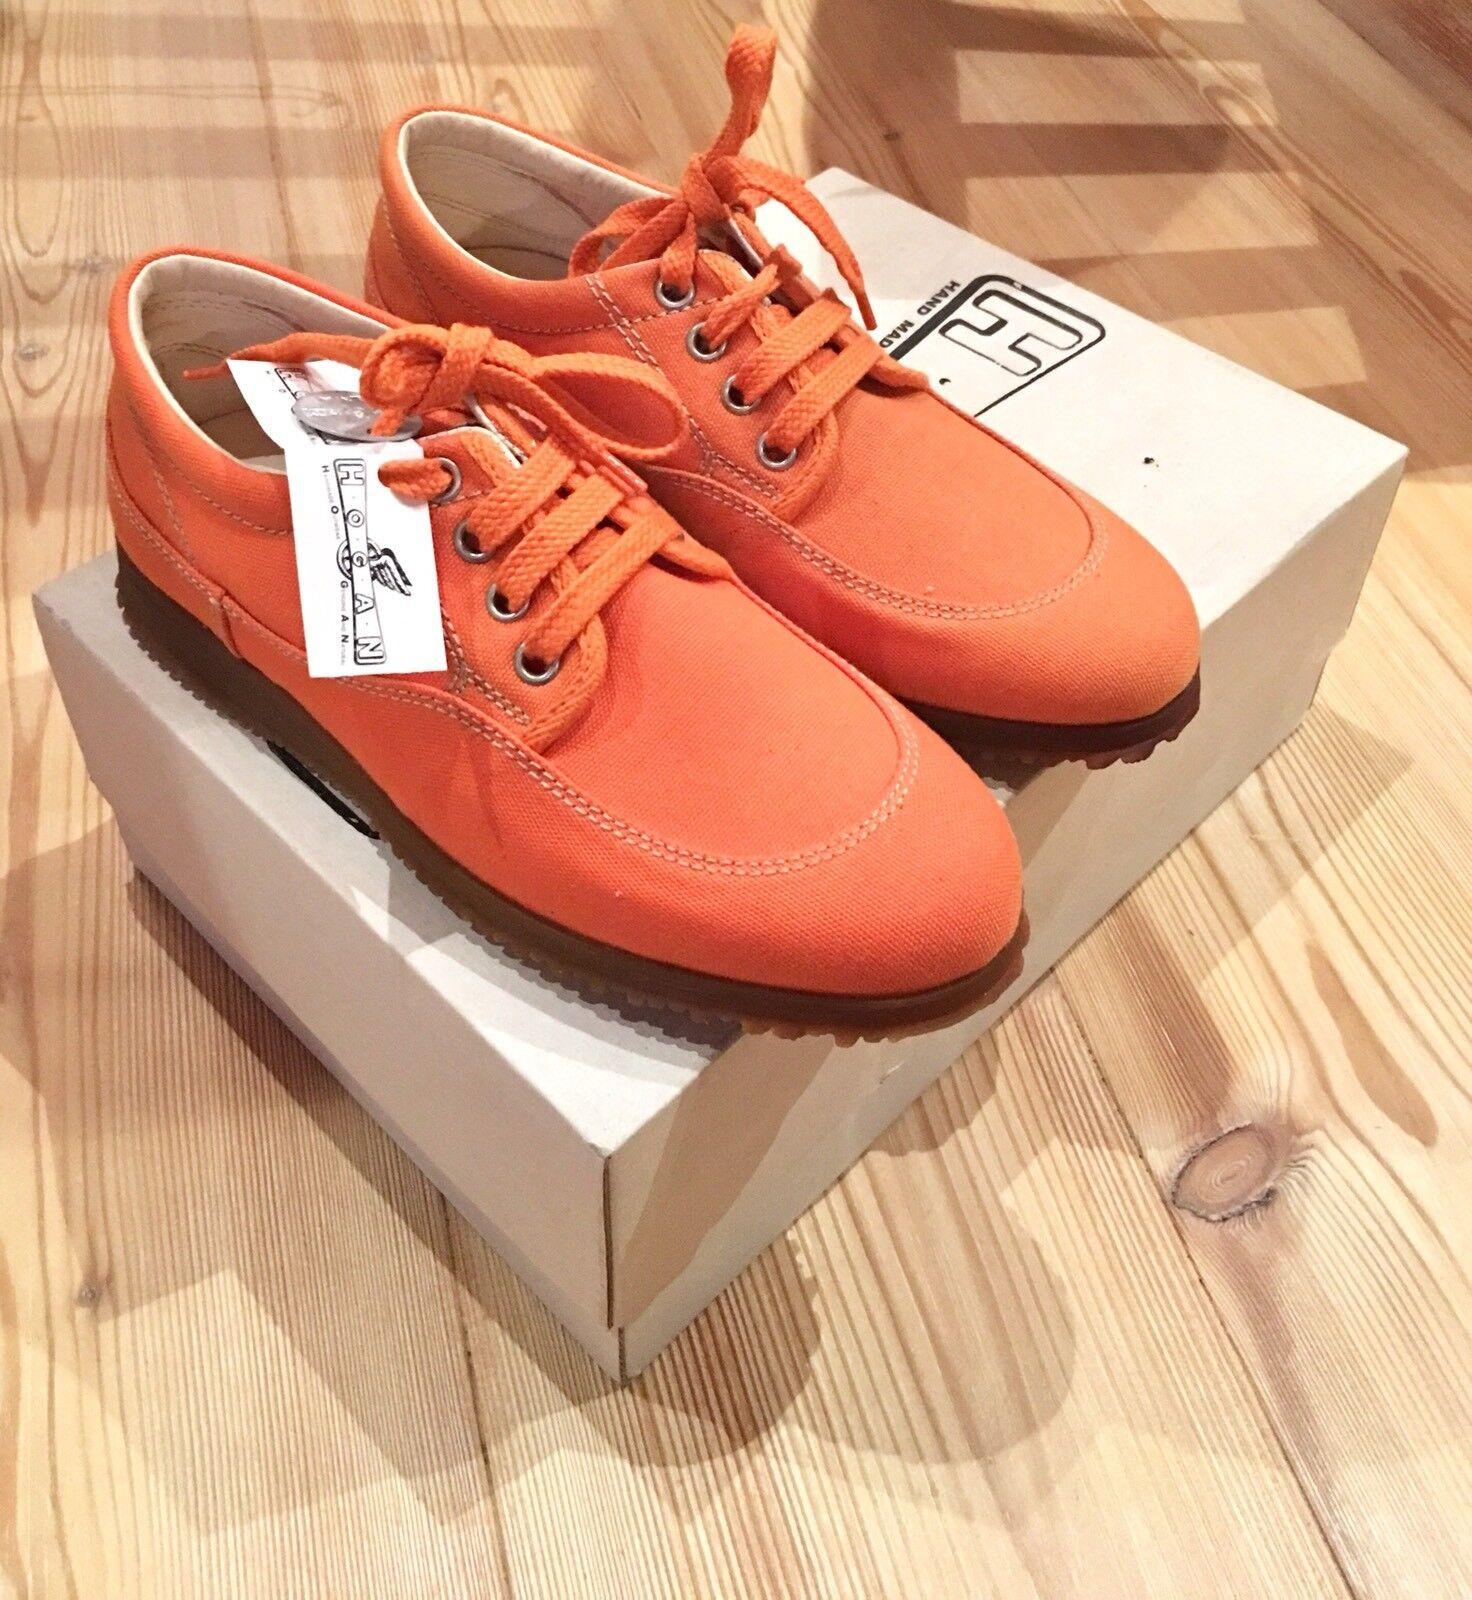 scarpe hogan donna tela arancione n. 35. nuove